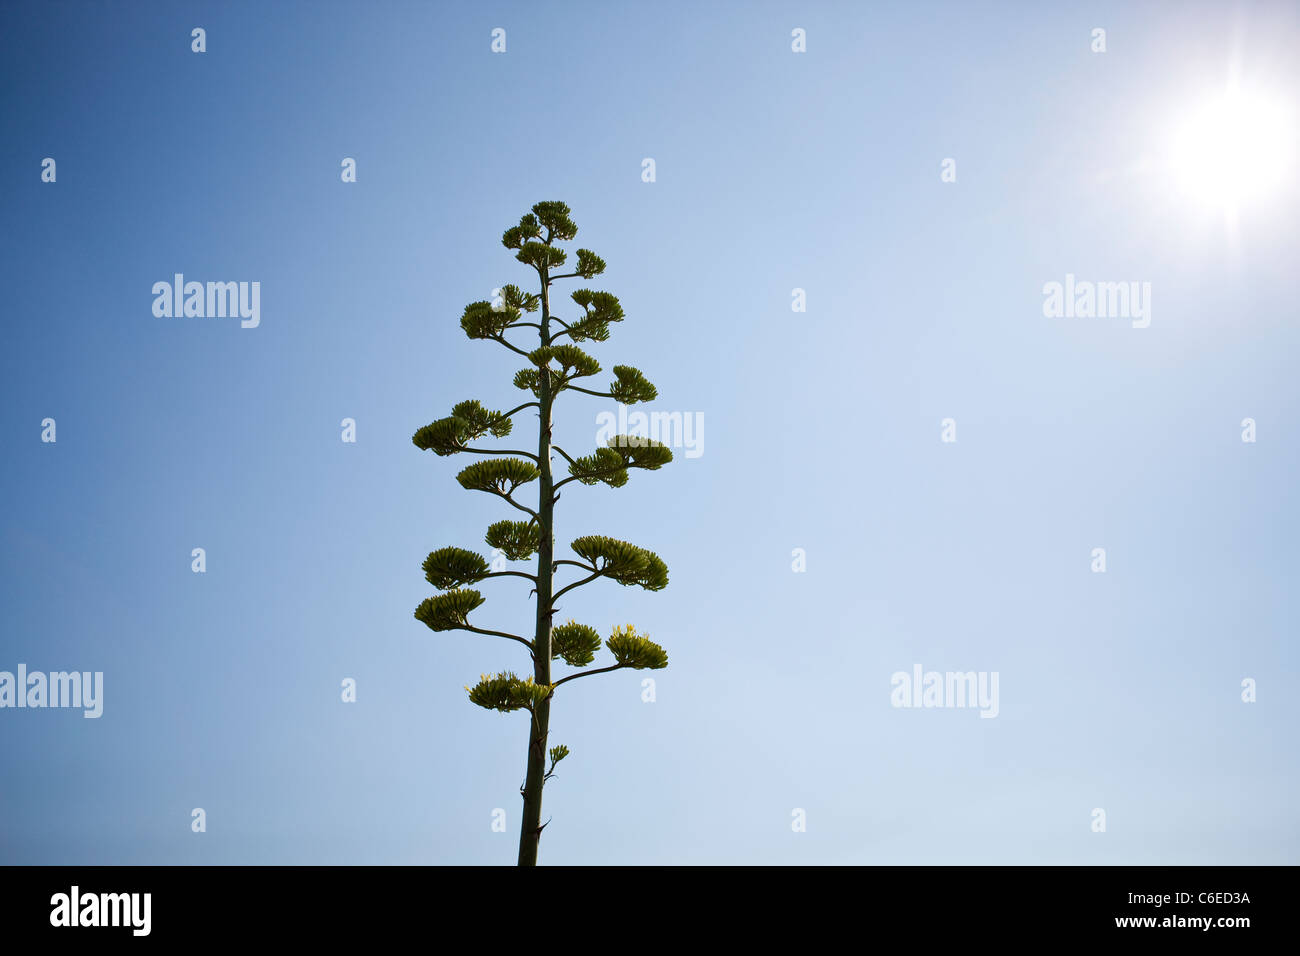 Eine Aloe Vera Pflanze in Blüte Stockfoto